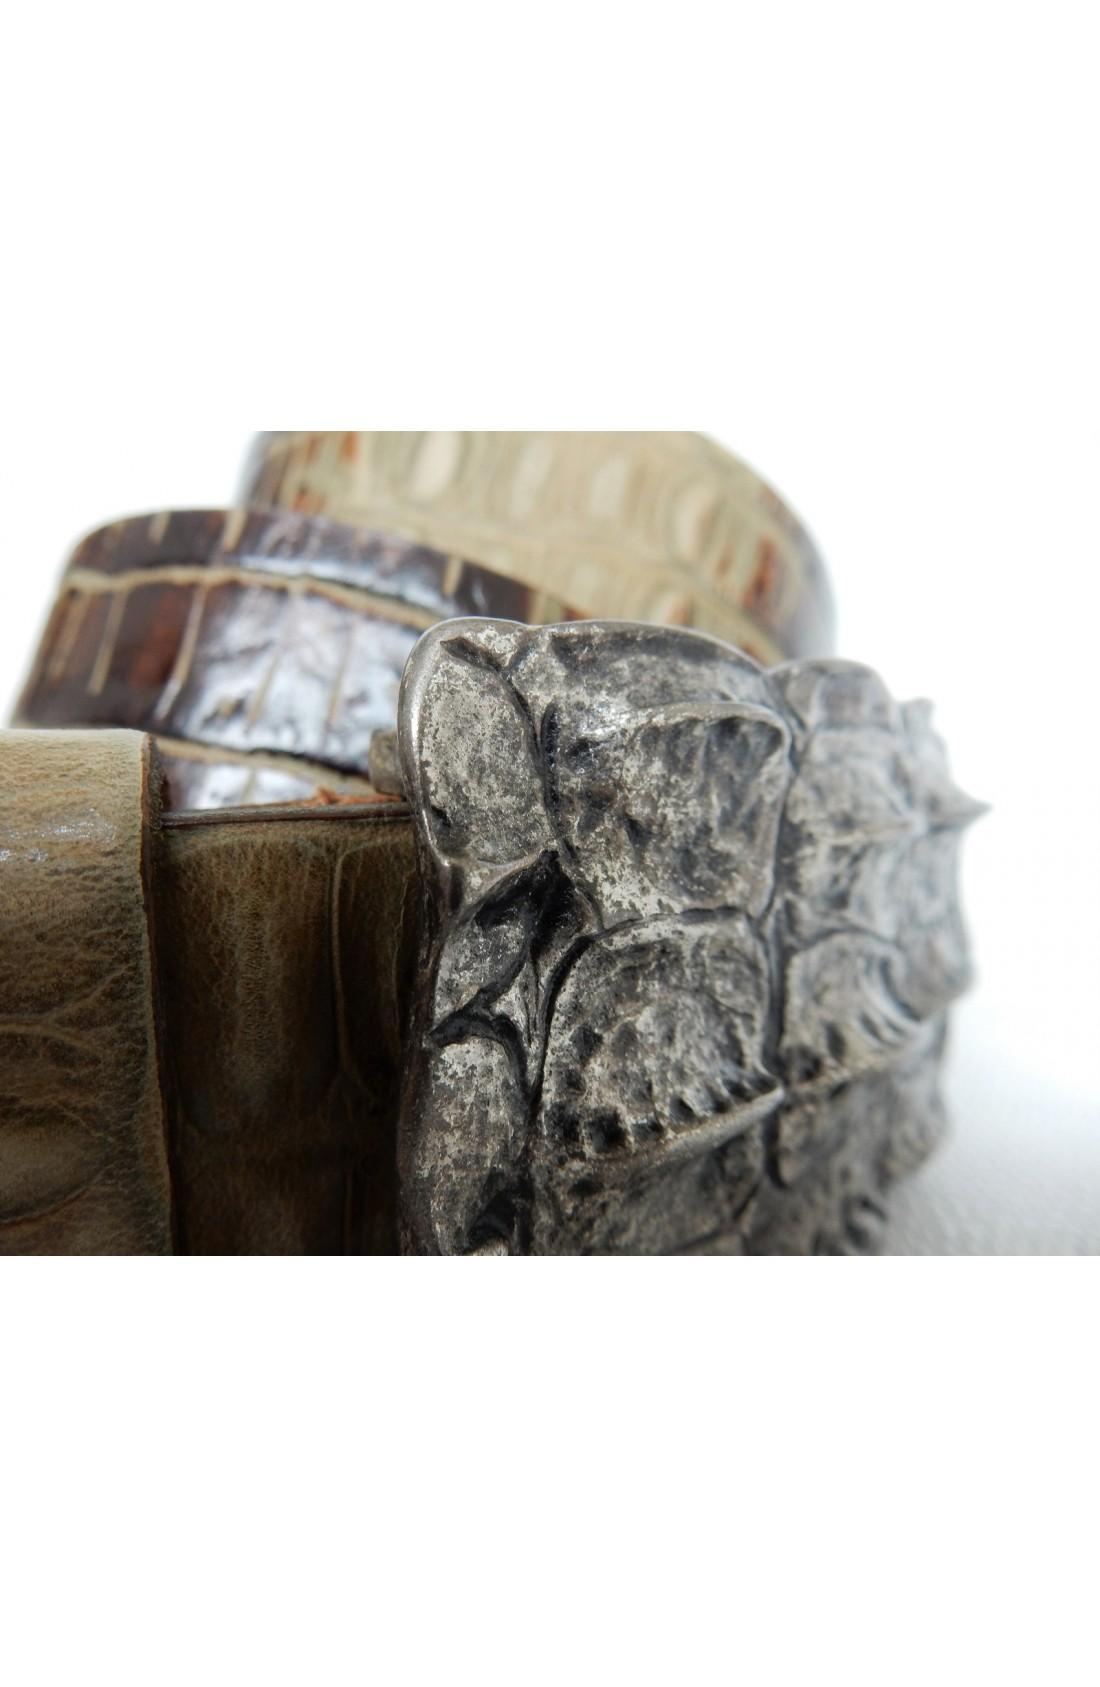 CINTURA UNISEX art.311 COCCO CROCK stampa su vitello mm.35 var.41 taupe placca squam coccP 20 (2)